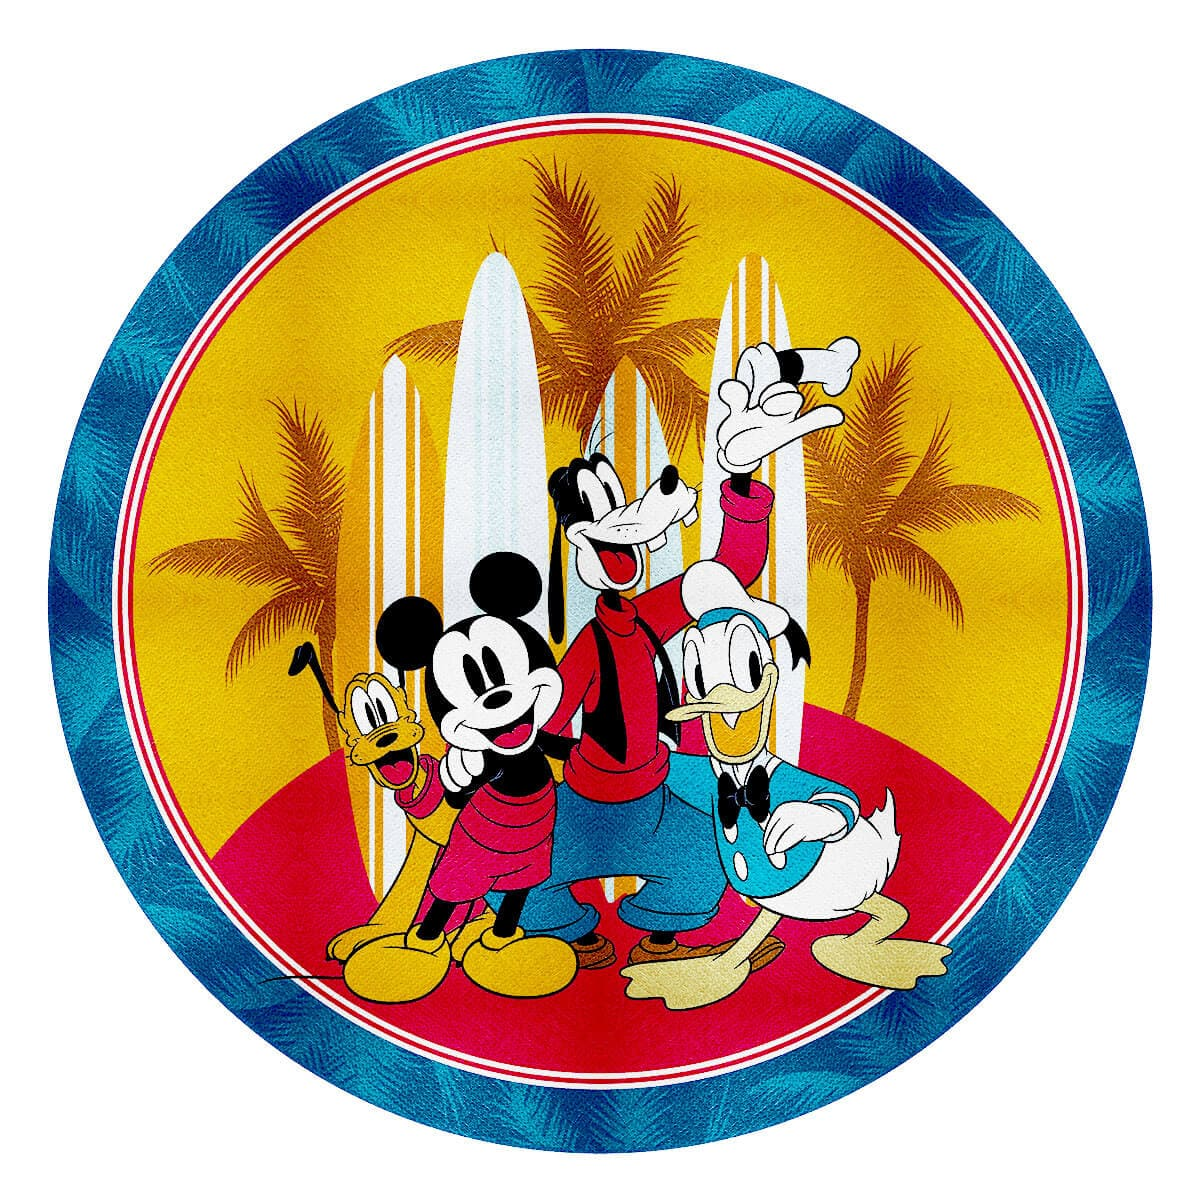 Toalha de Praia Infantil Aveludada Redonda Mickey Turma do Mickey